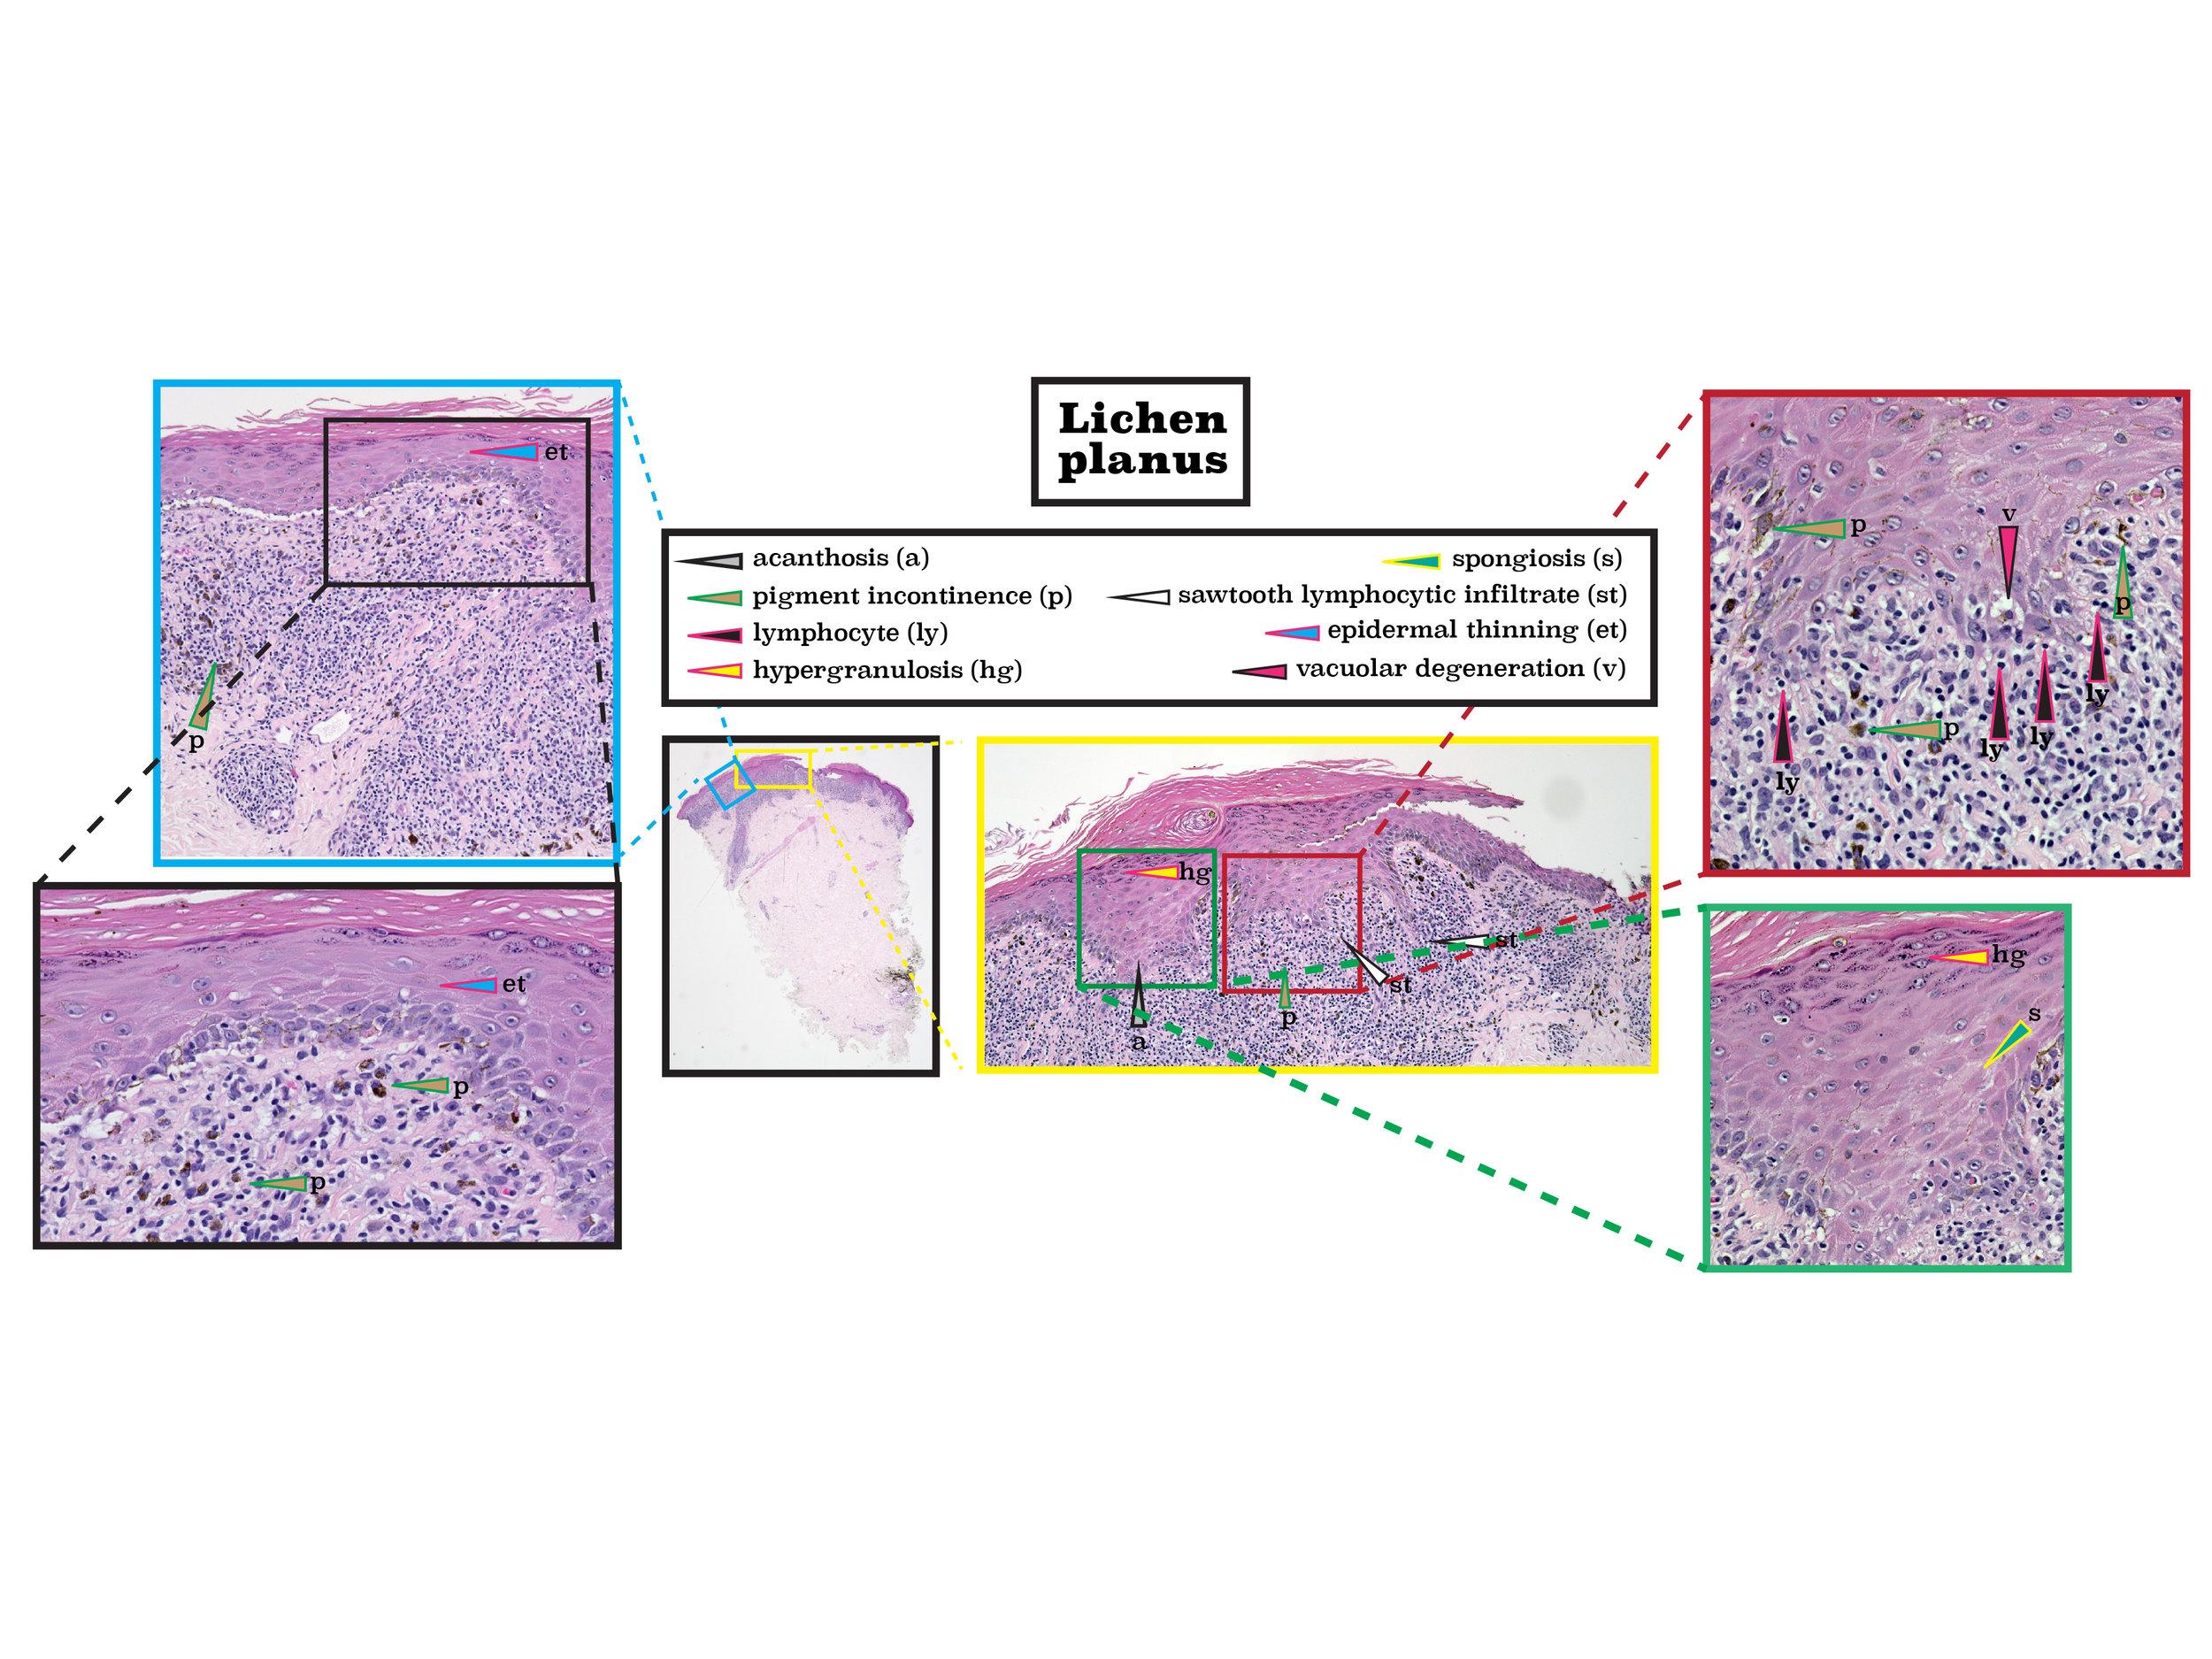 Z 5 lichen planus-01.jpg